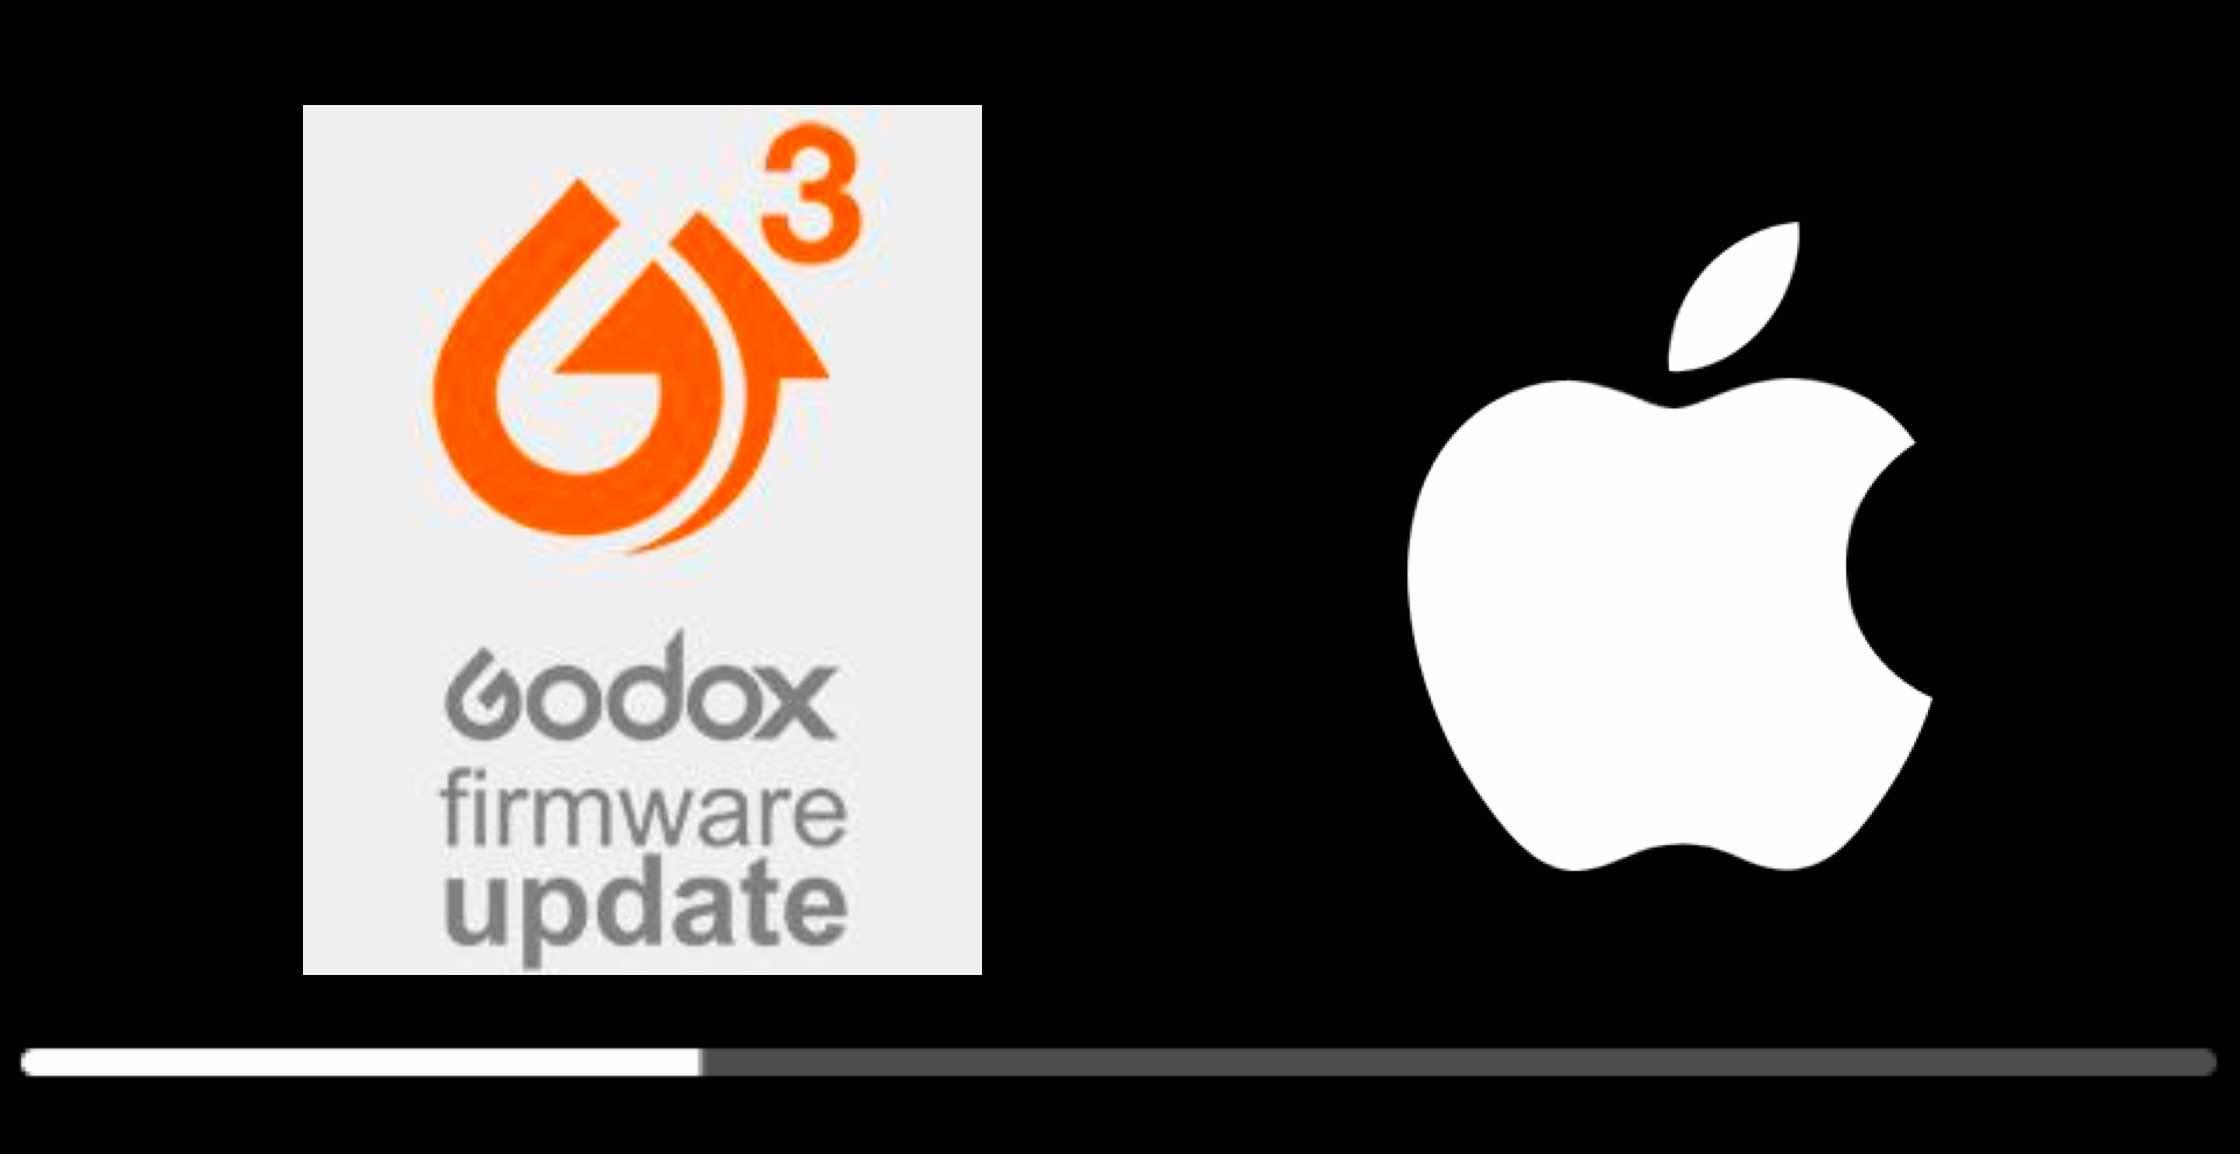 Godox G3 Firmware Update Software For Mac Available Fuji Rumors